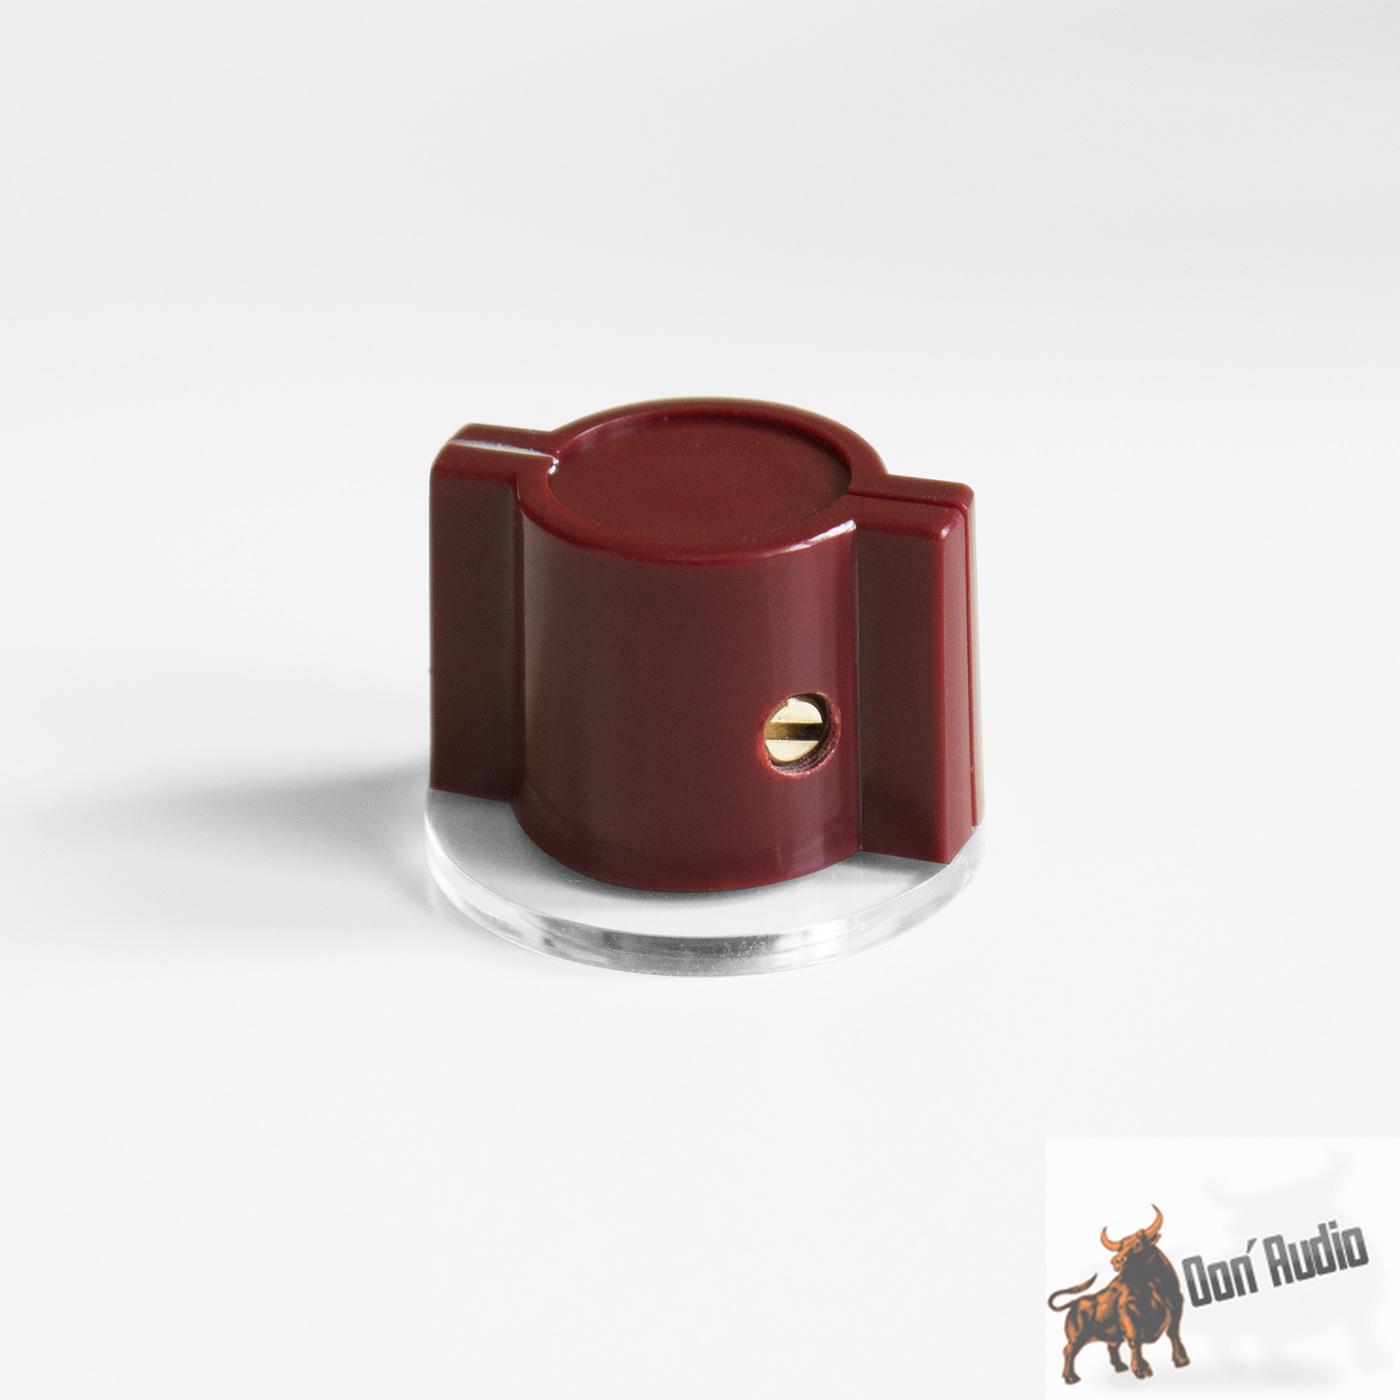 marconi knob set screw